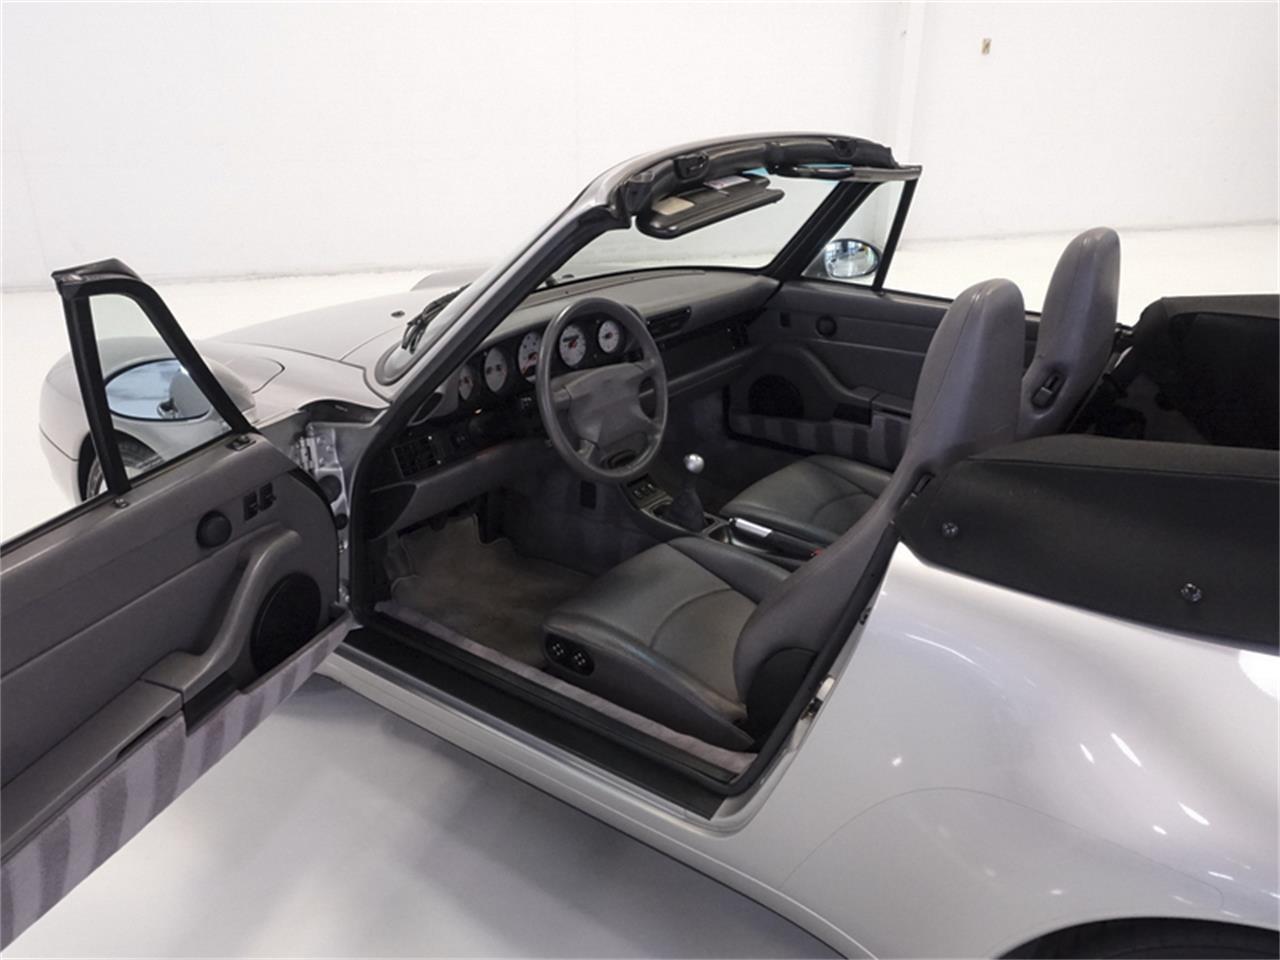 1998 Porsche 911 Carrera (CC-1234207) for sale in Saint Louis, Missouri